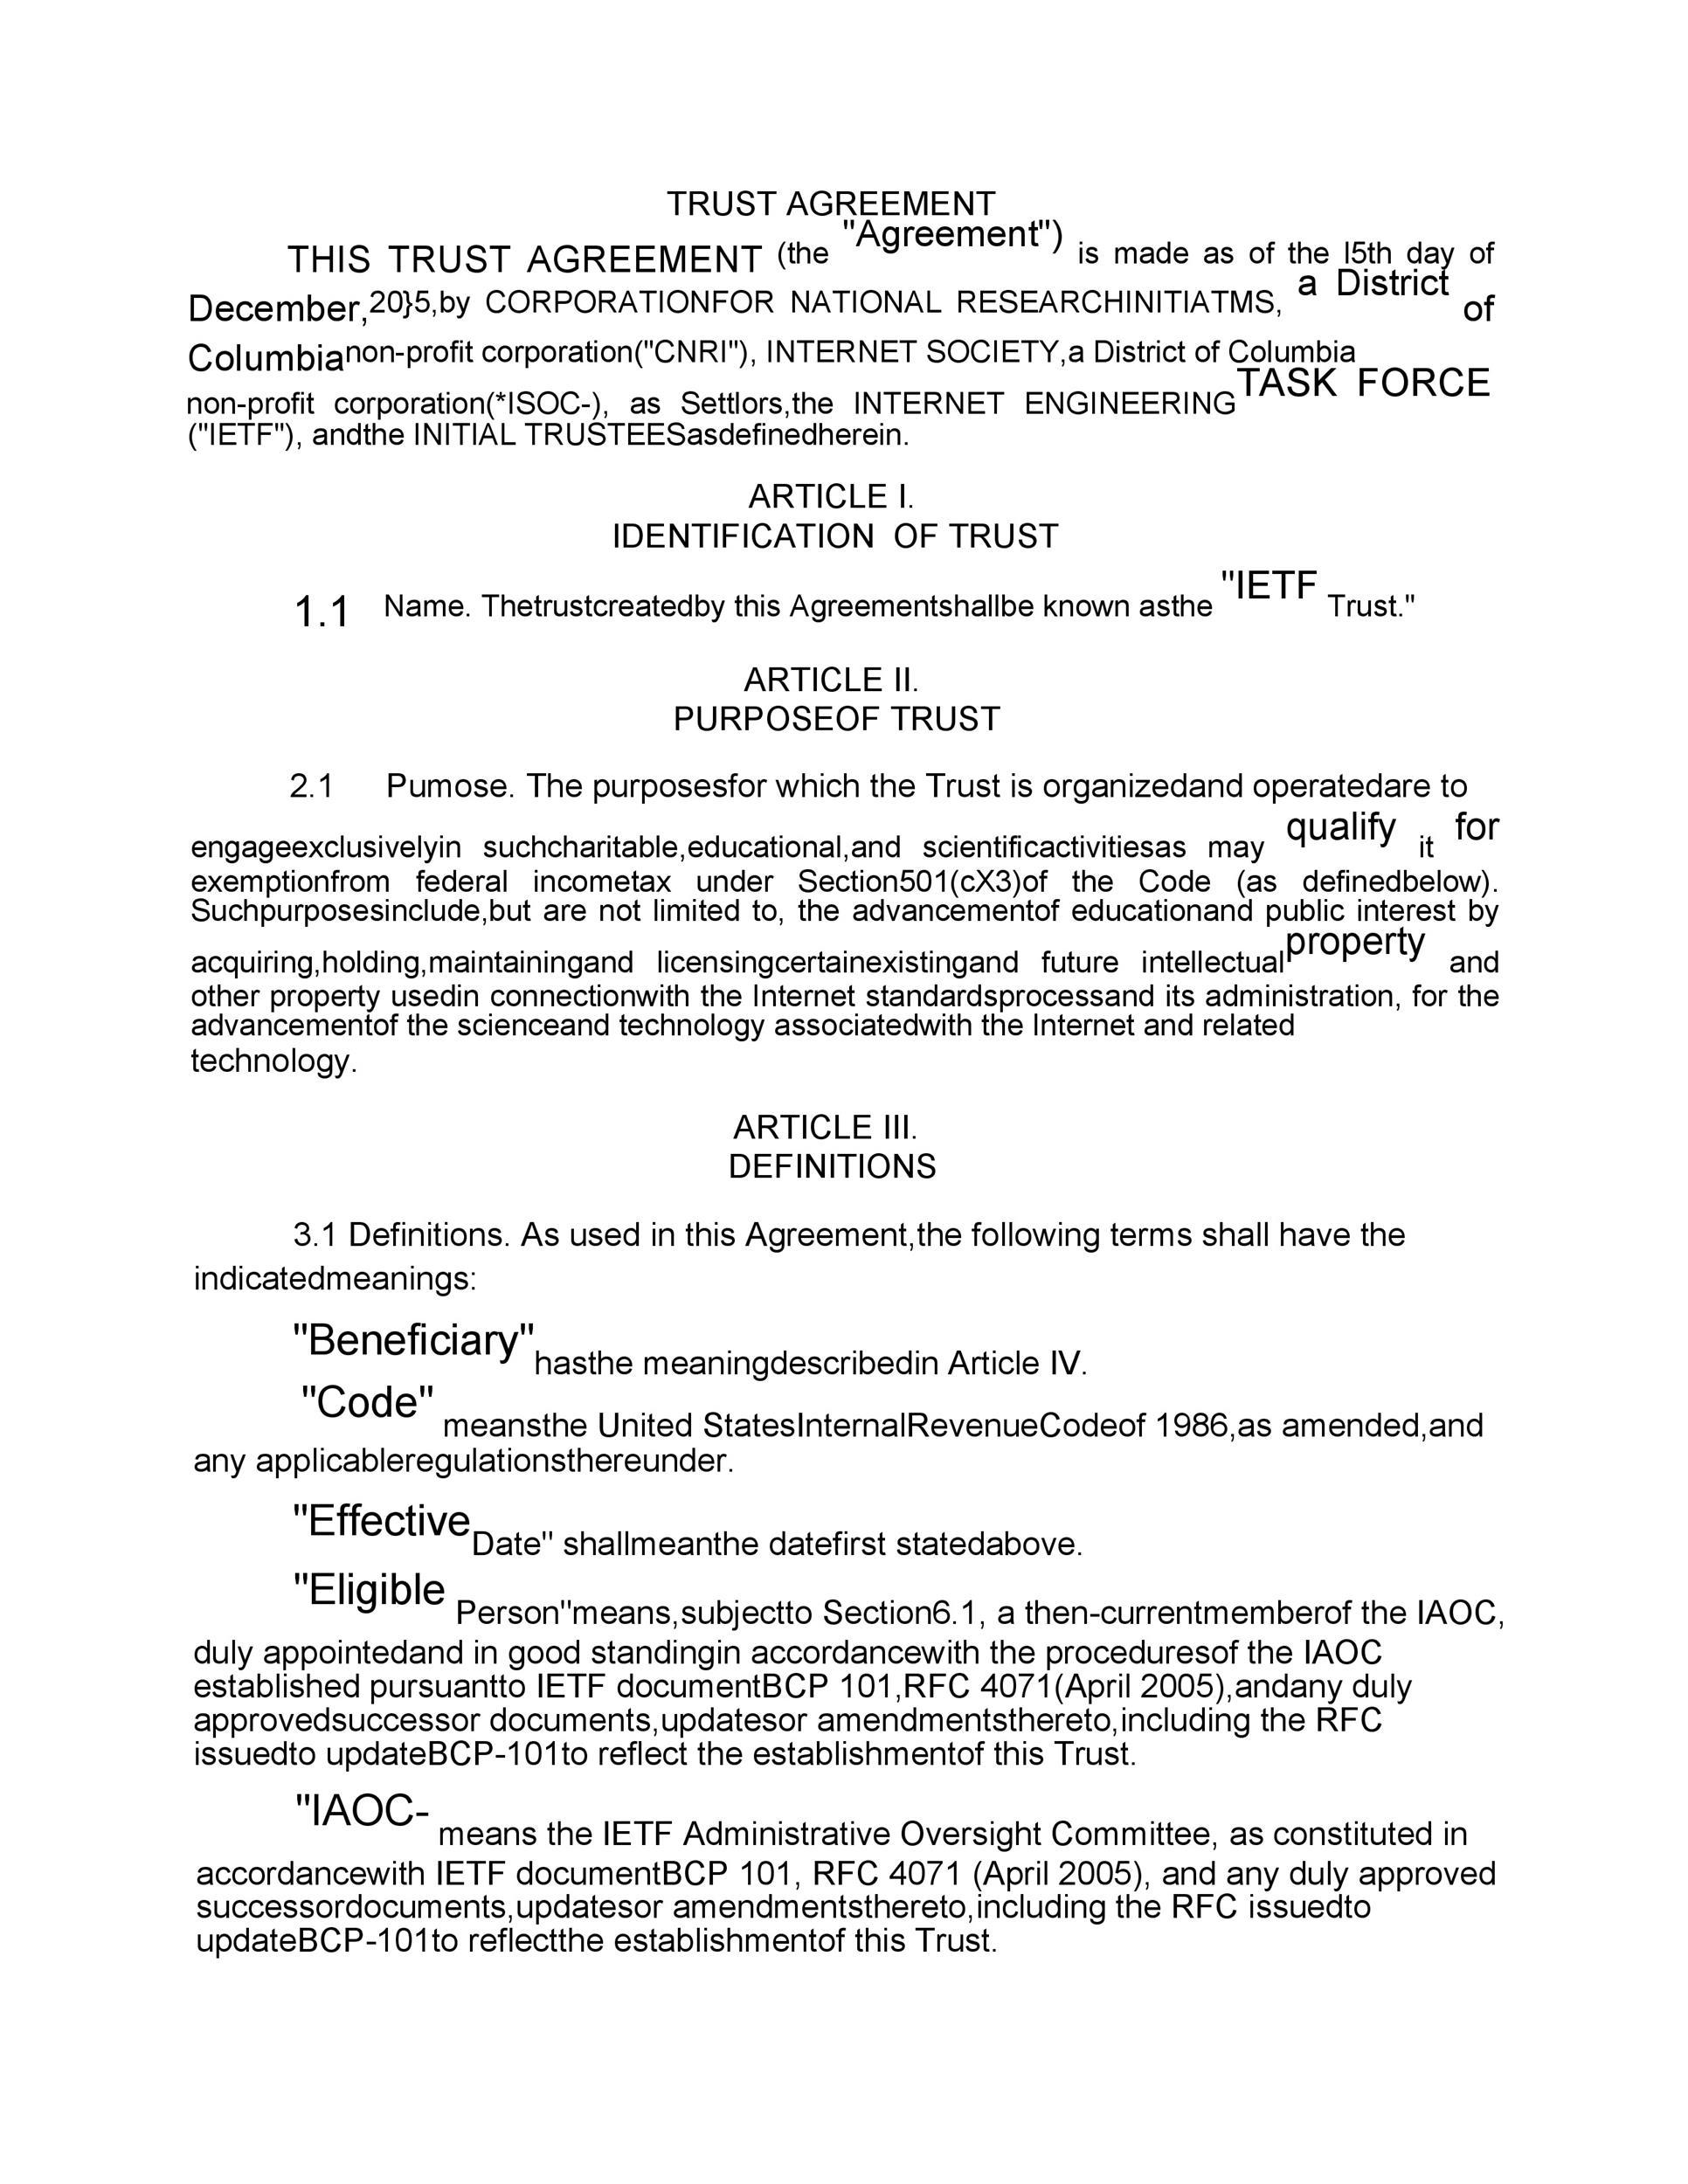 Free trust agreement 02